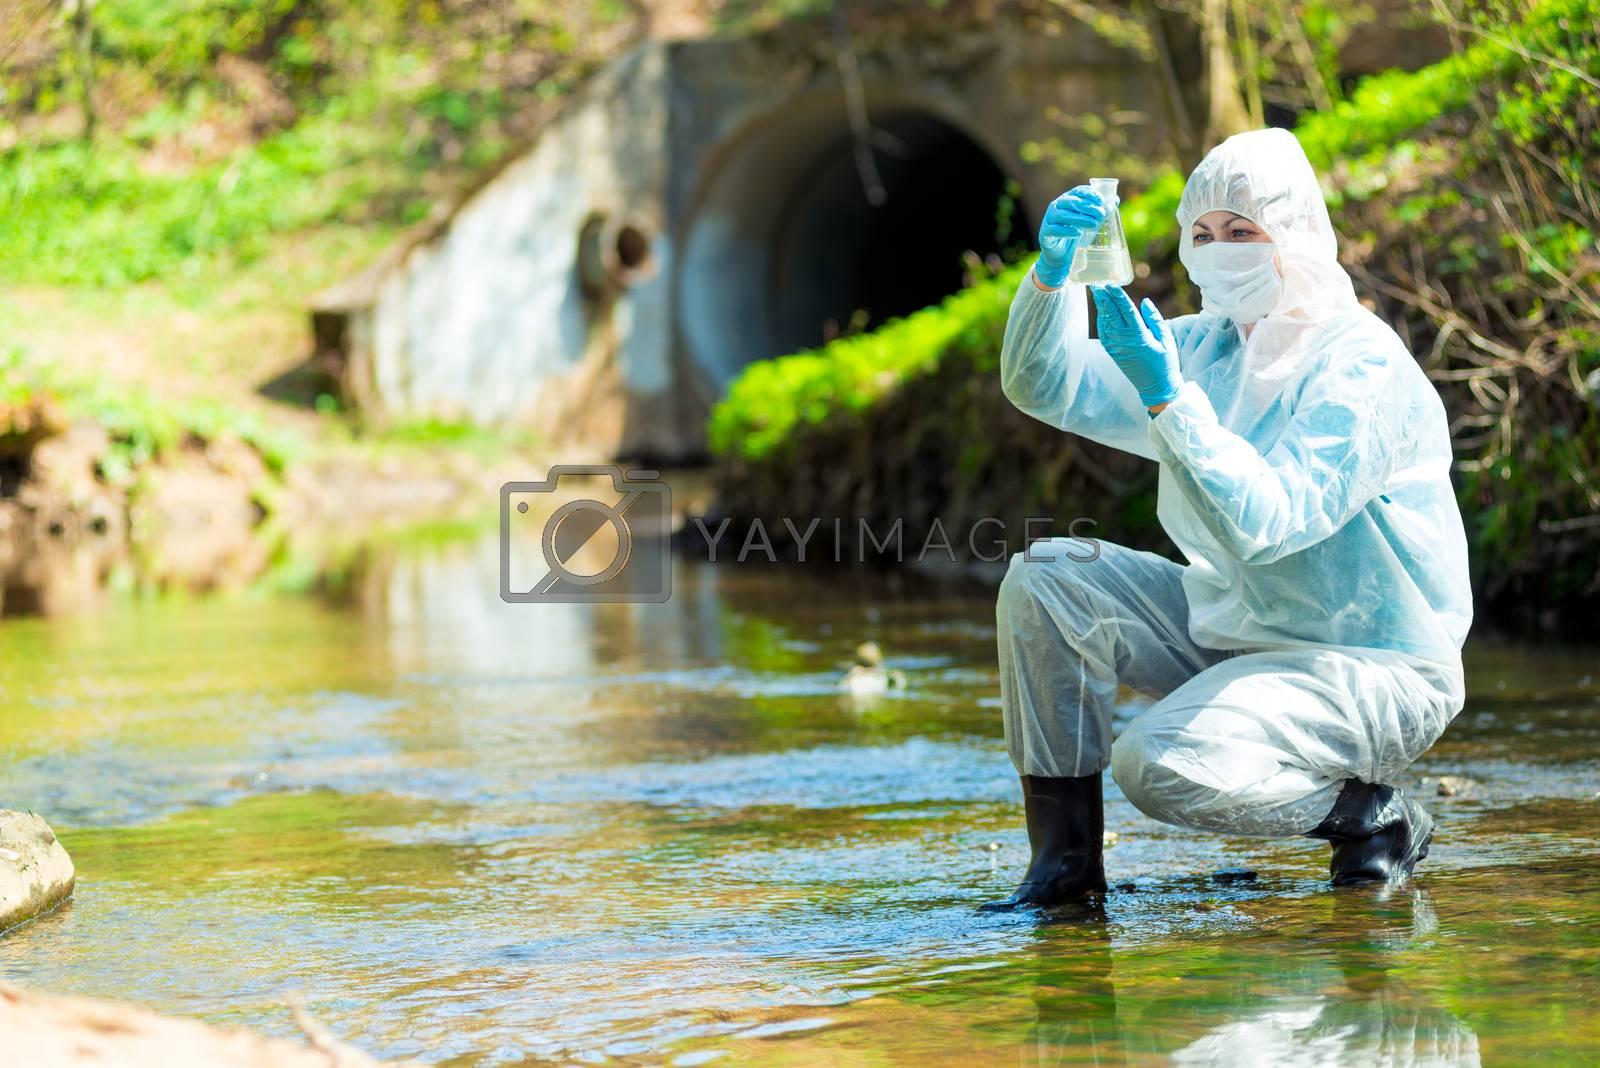 hazardous contaminated sewage water, environmentalist job